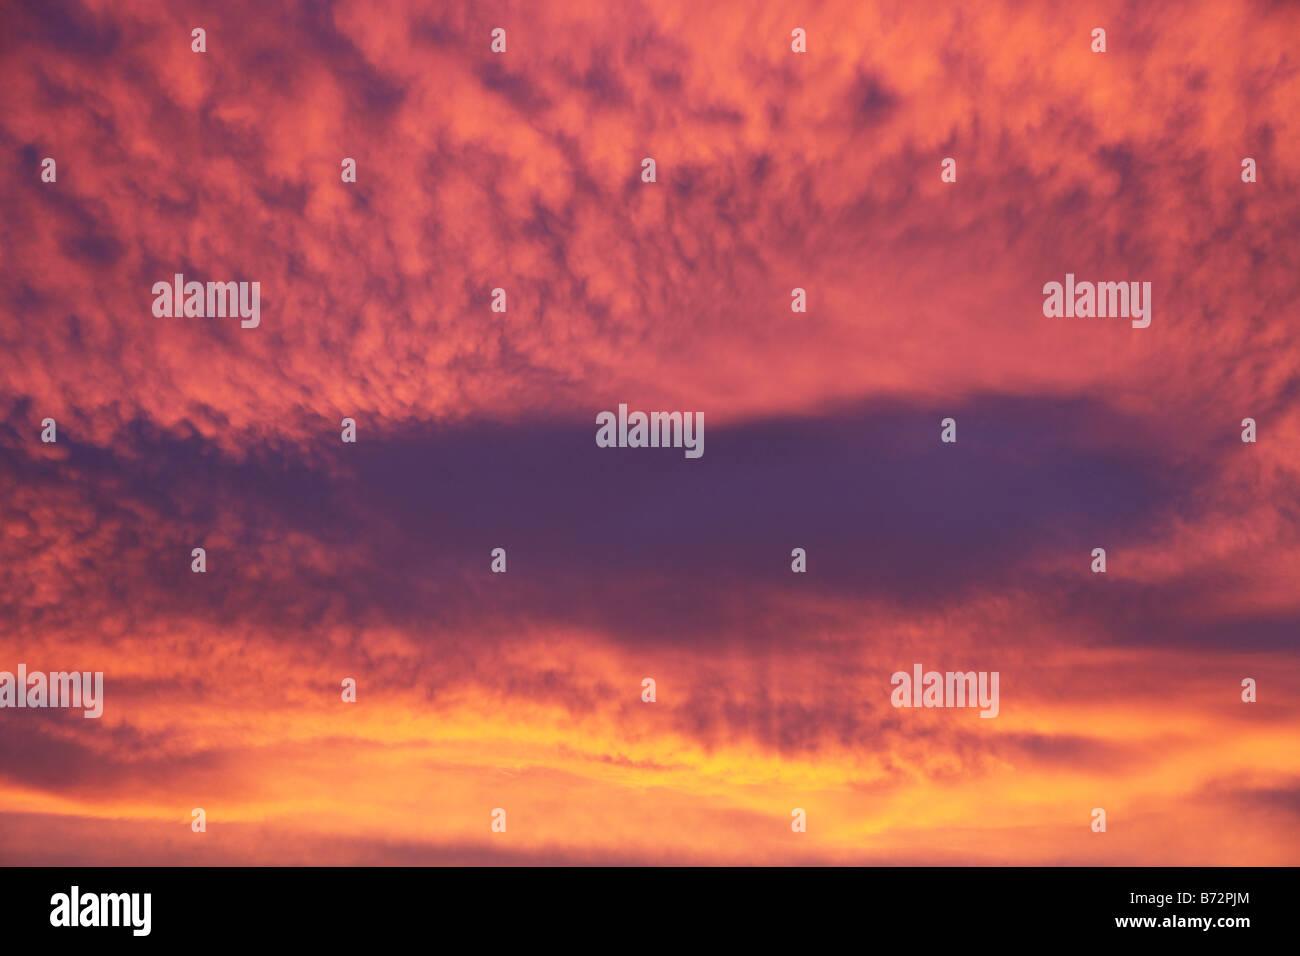 raincloud at sunrise Co Monaghan Ireland - Stock Image